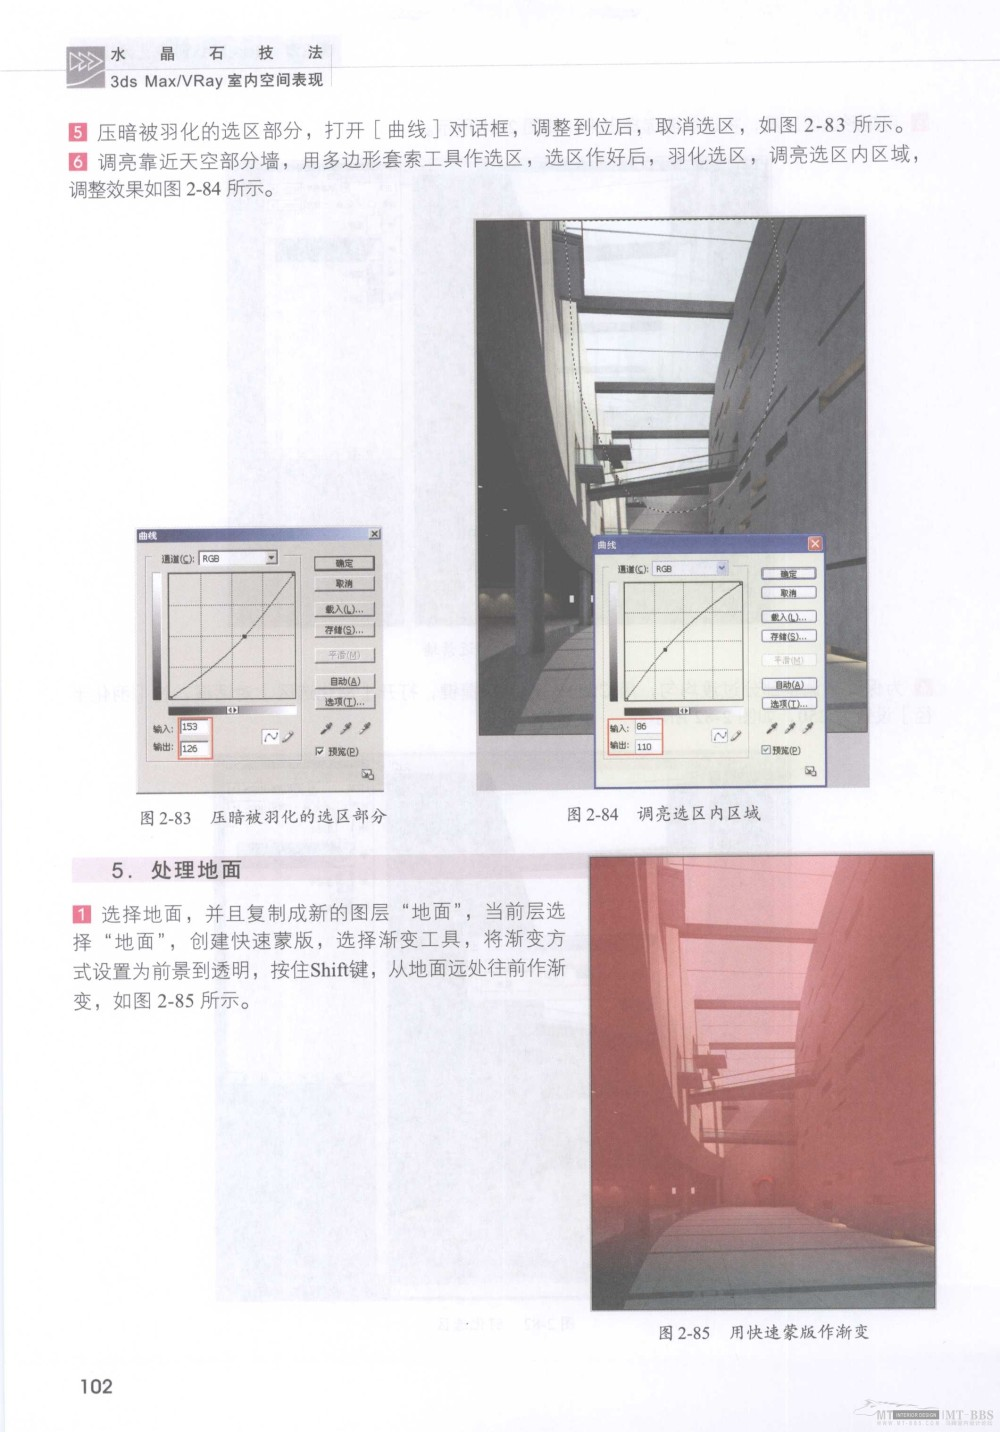 水晶石技法-3ds_Max&VRay室内空间表现_水晶石技法-3ds_Max&VRay室内空间表现_页面_108.jpg